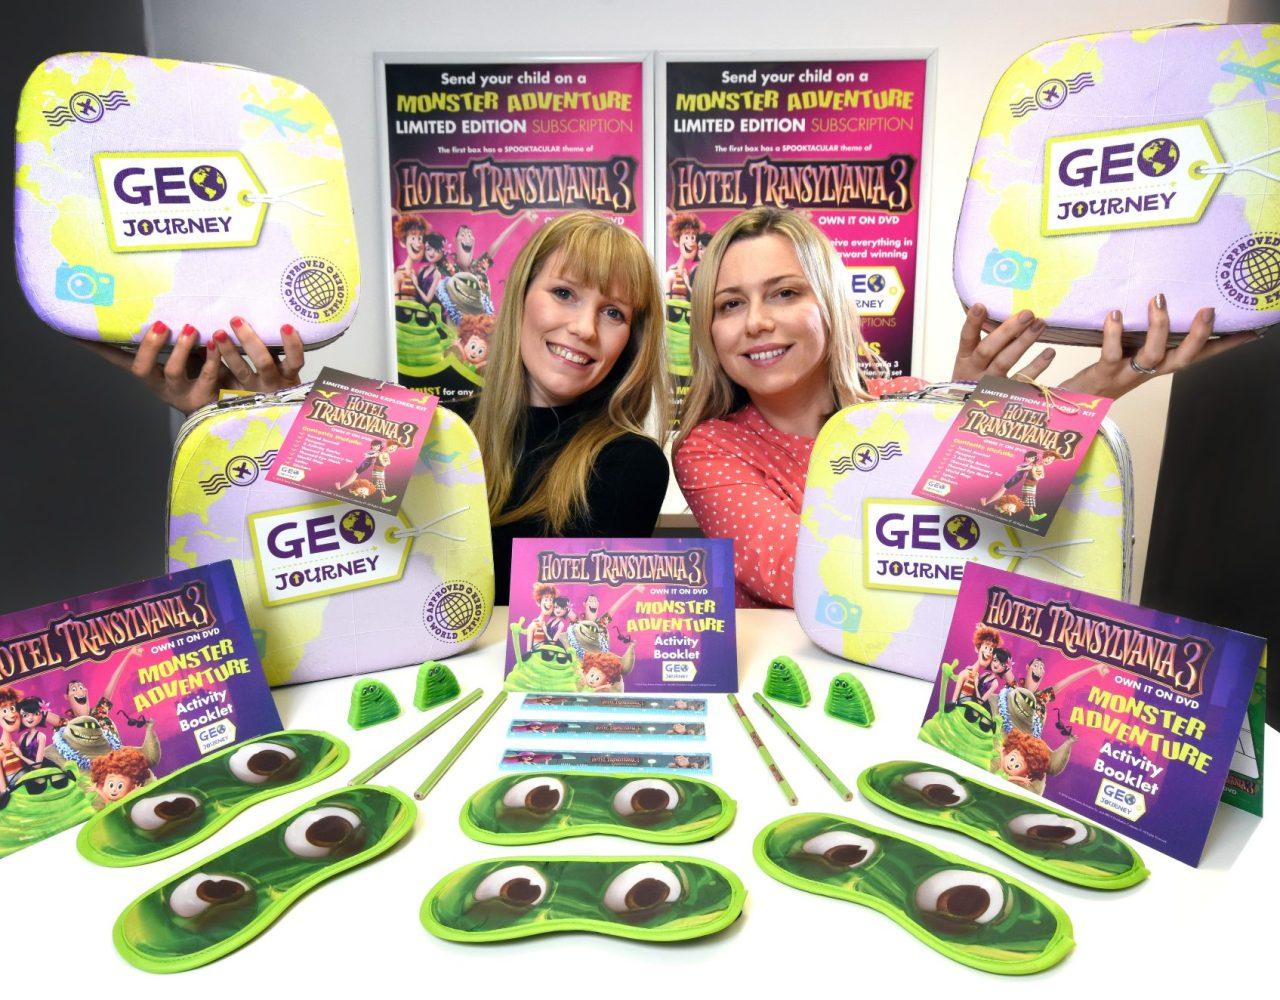 Sunderland's Geo Journey celebrates the DVD release of Hotel Transylvania 3